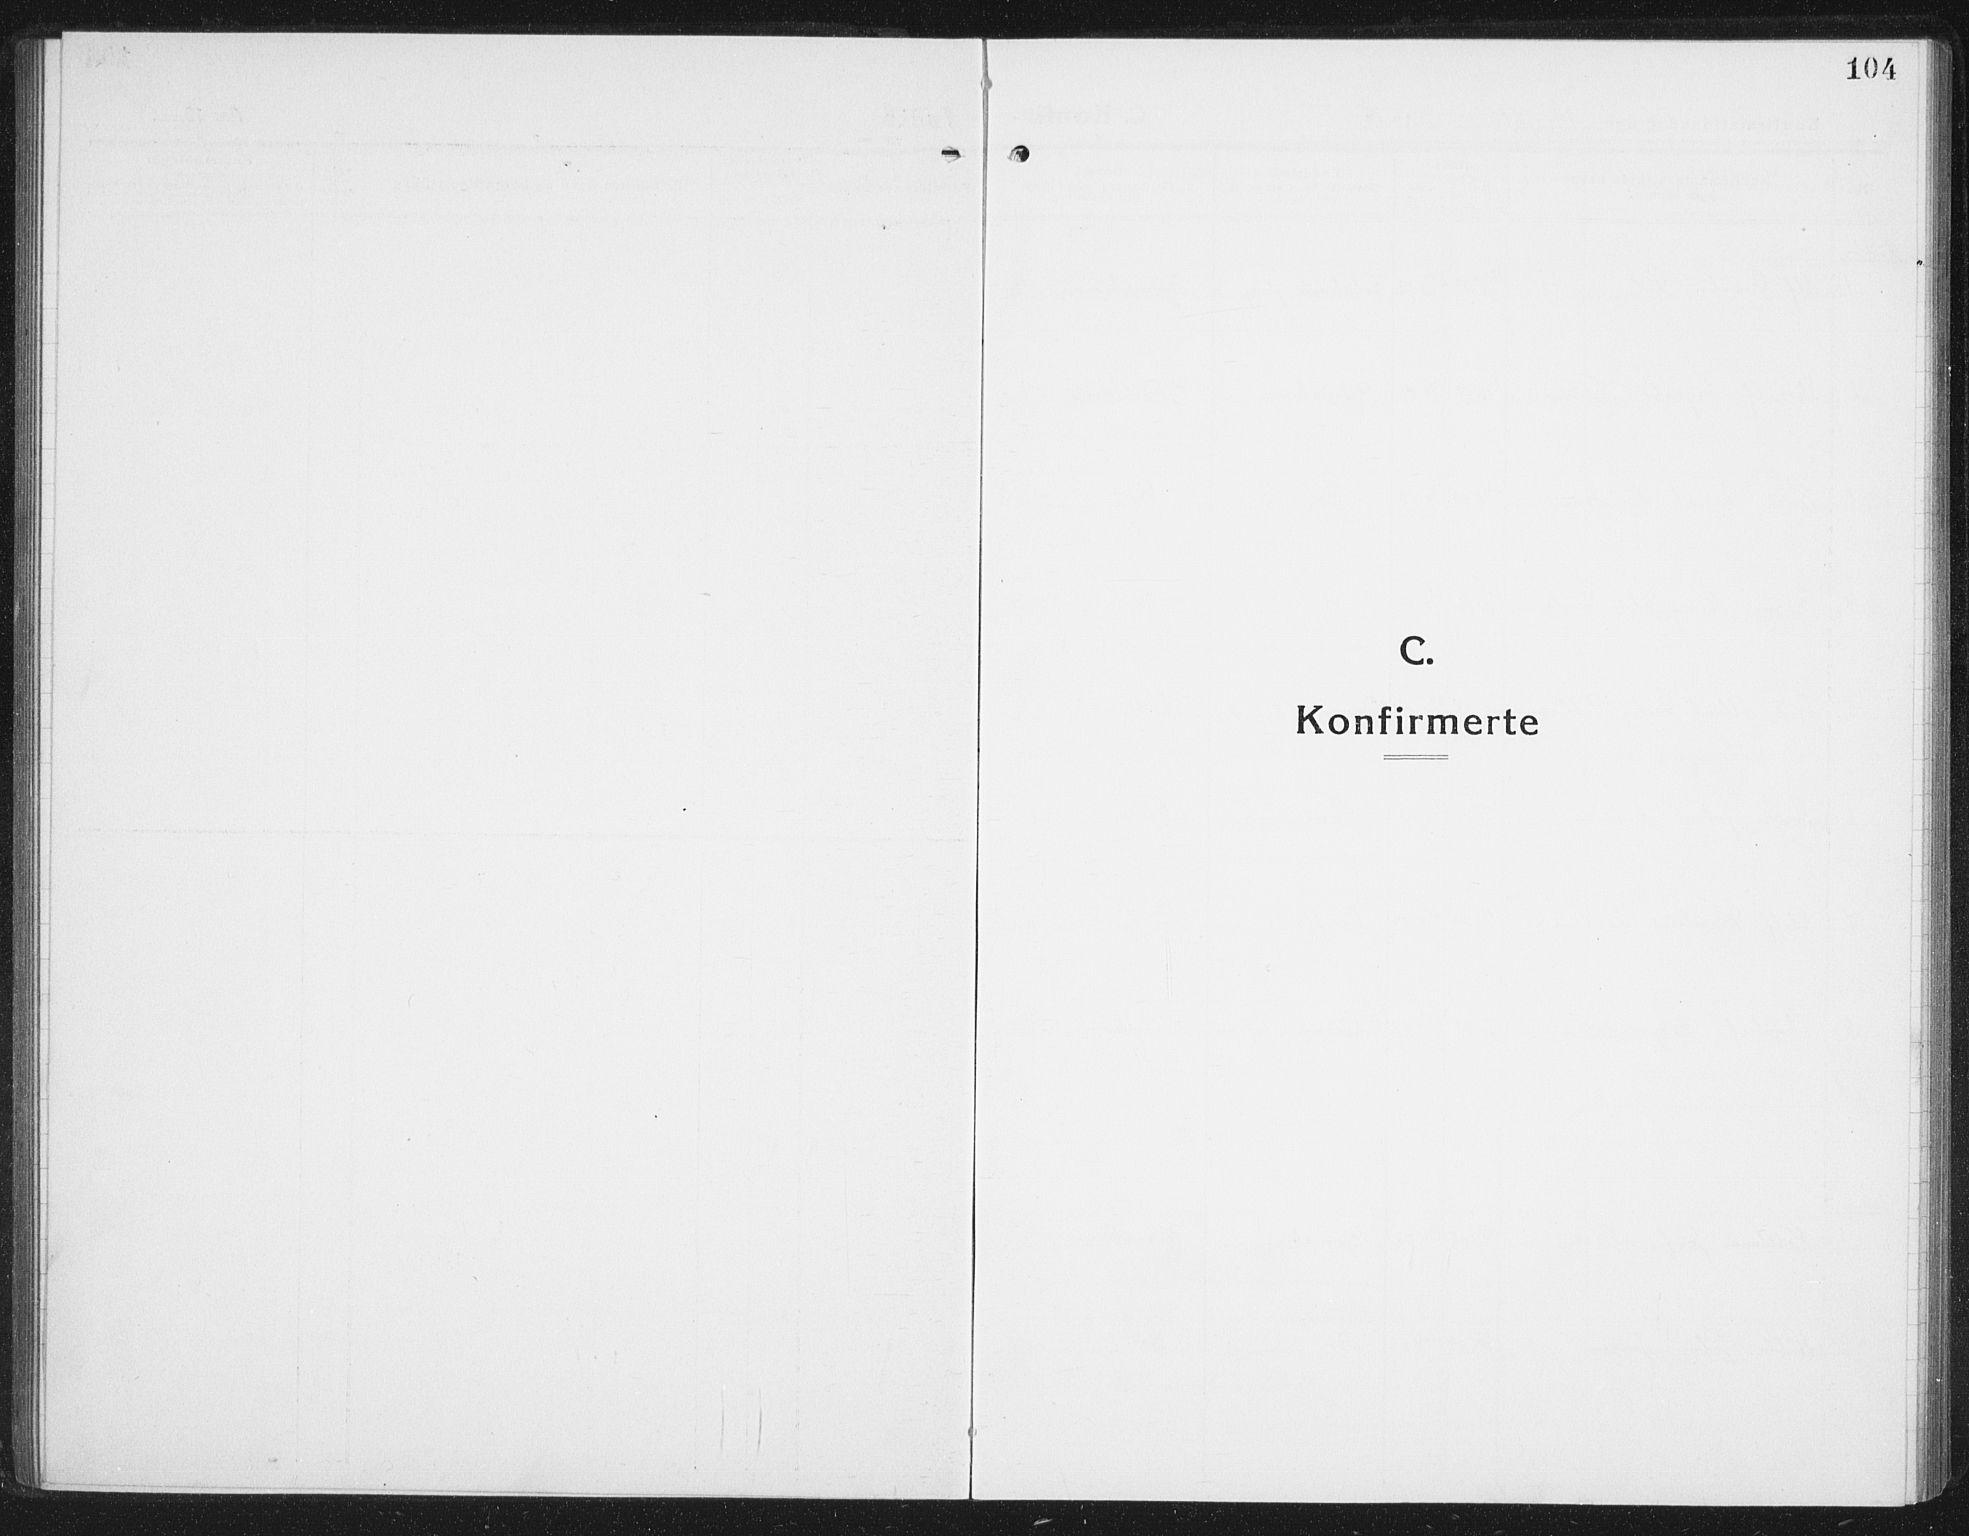 SAT, Ministerialprotokoller, klokkerbøker og fødselsregistre - Nordland, 898/L1428: Klokkerbok nr. 898C03, 1918-1938, s. 104